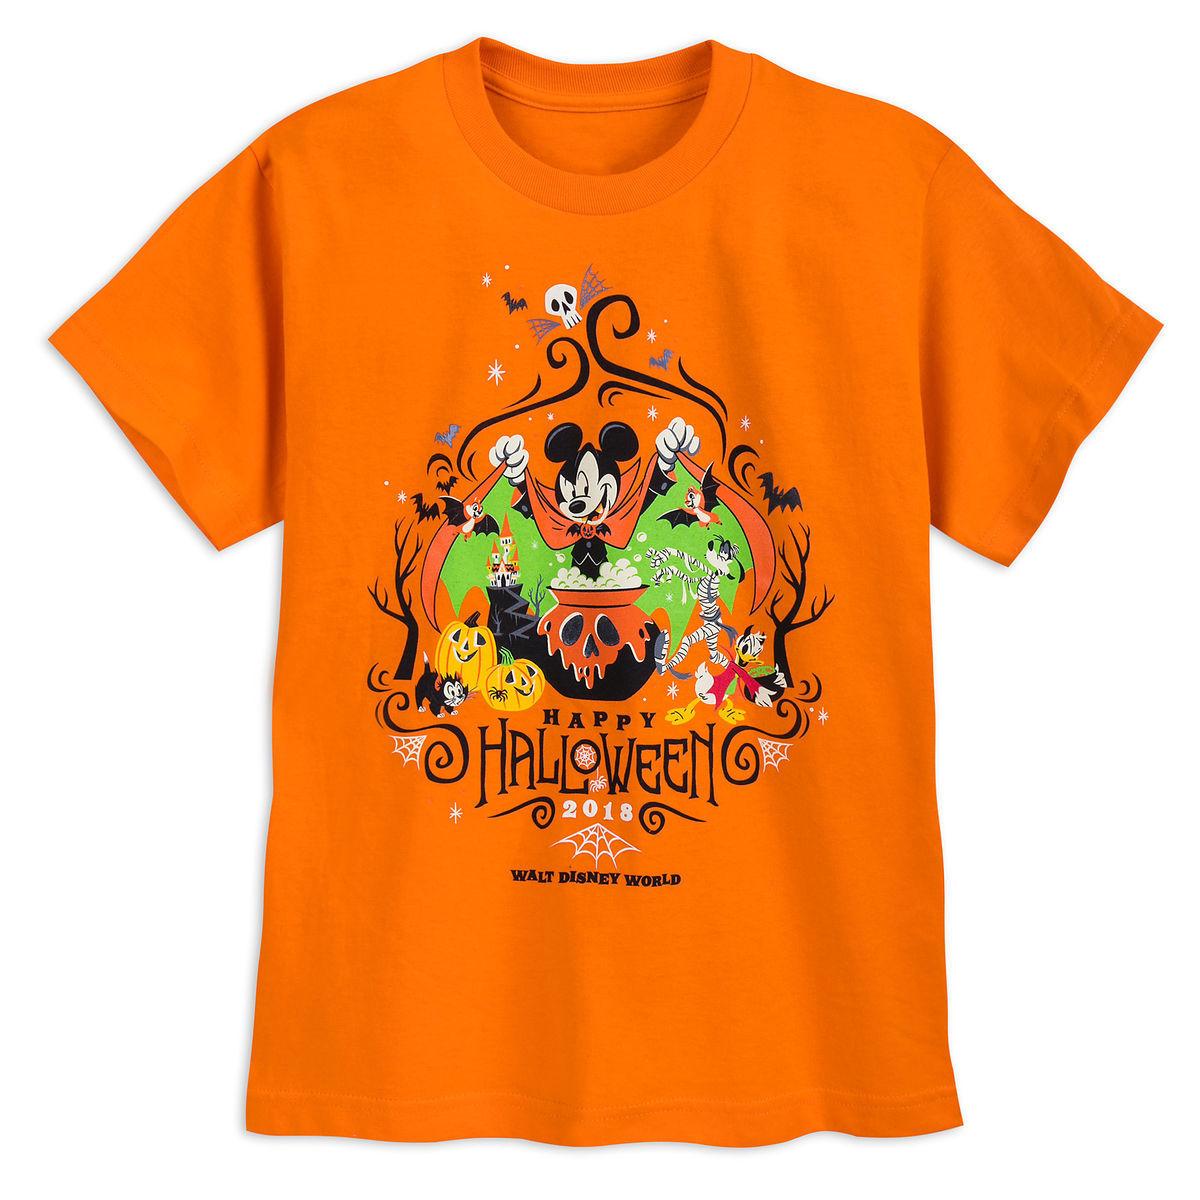 Disney Halloween Shirts 2019.Disney Child Shirt Halloween 2018 Mickey Friends Orange